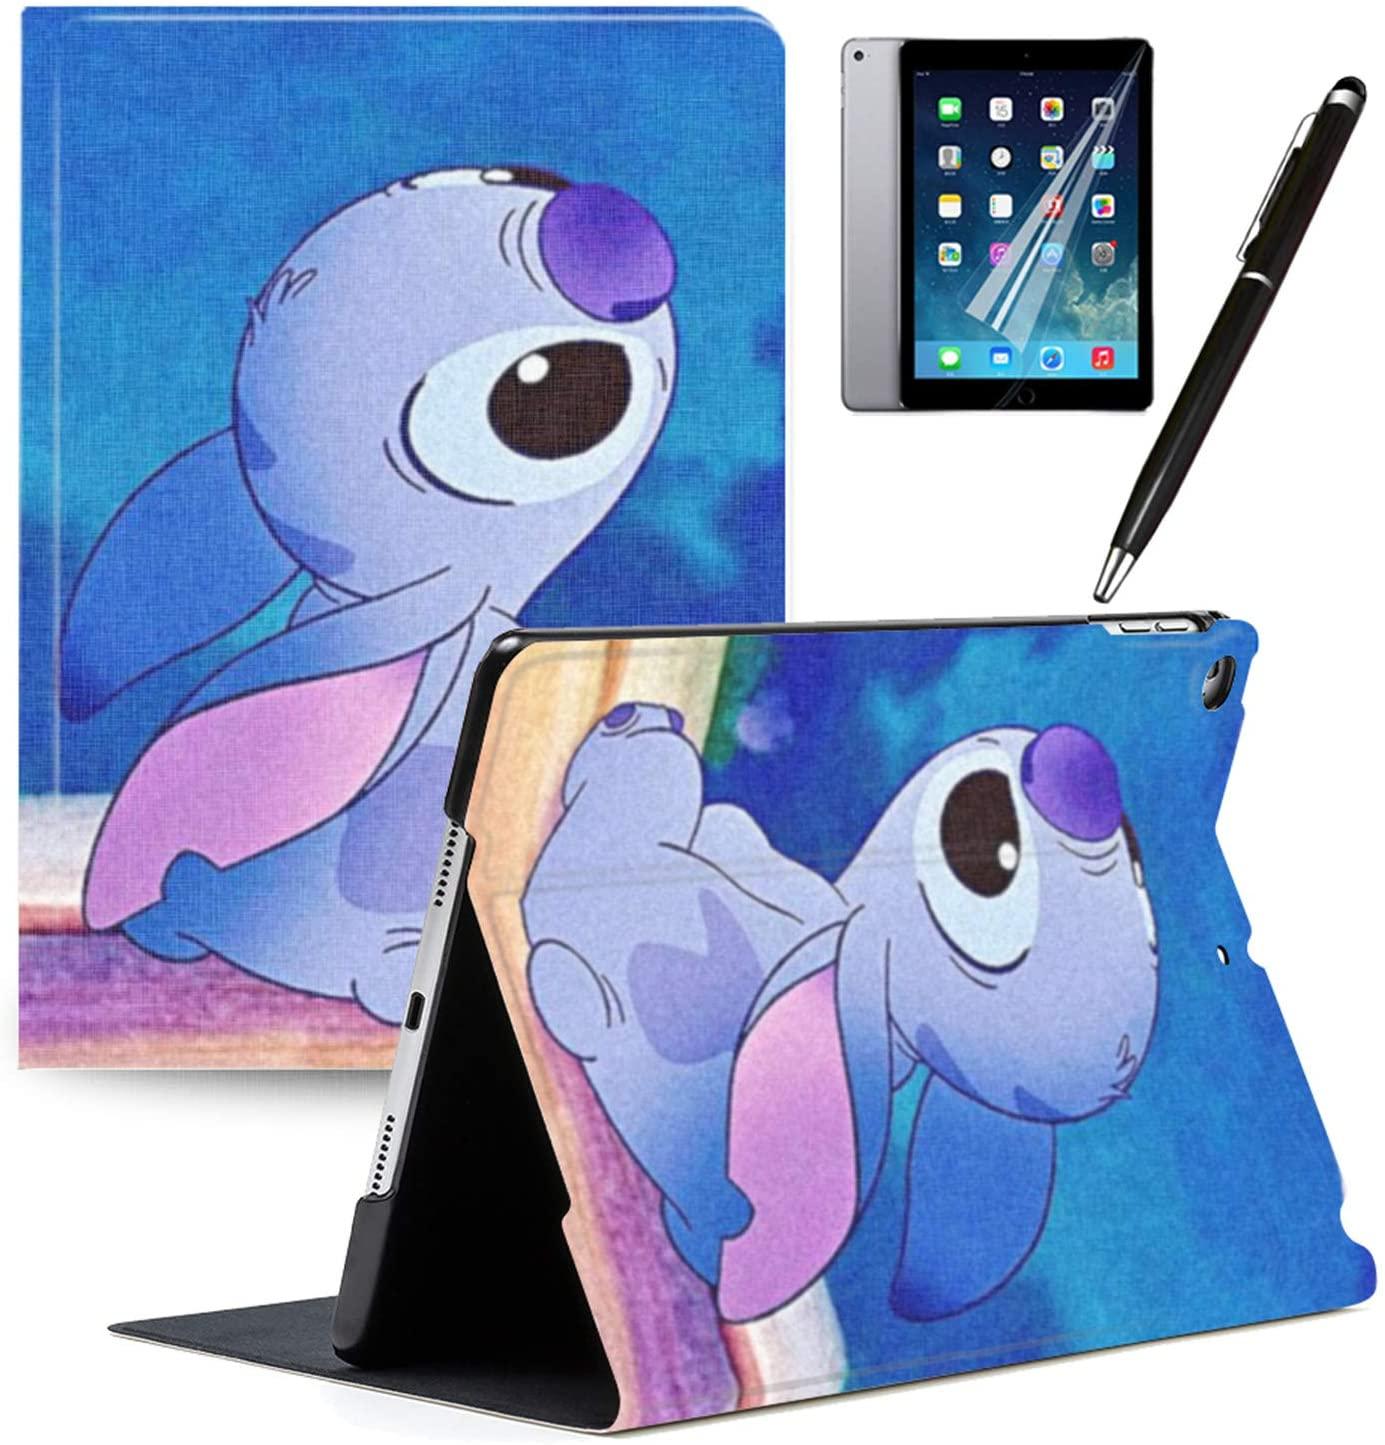 iPad 2018(6th Gen) iPad 2017(5th Gen) Case Cartoon Lilo & Stitch Cartoon Protection Lightweight PU Leather Smart Auto Sleep/Wake Cover Also Fit iPad Air 2 / iPad Air#A